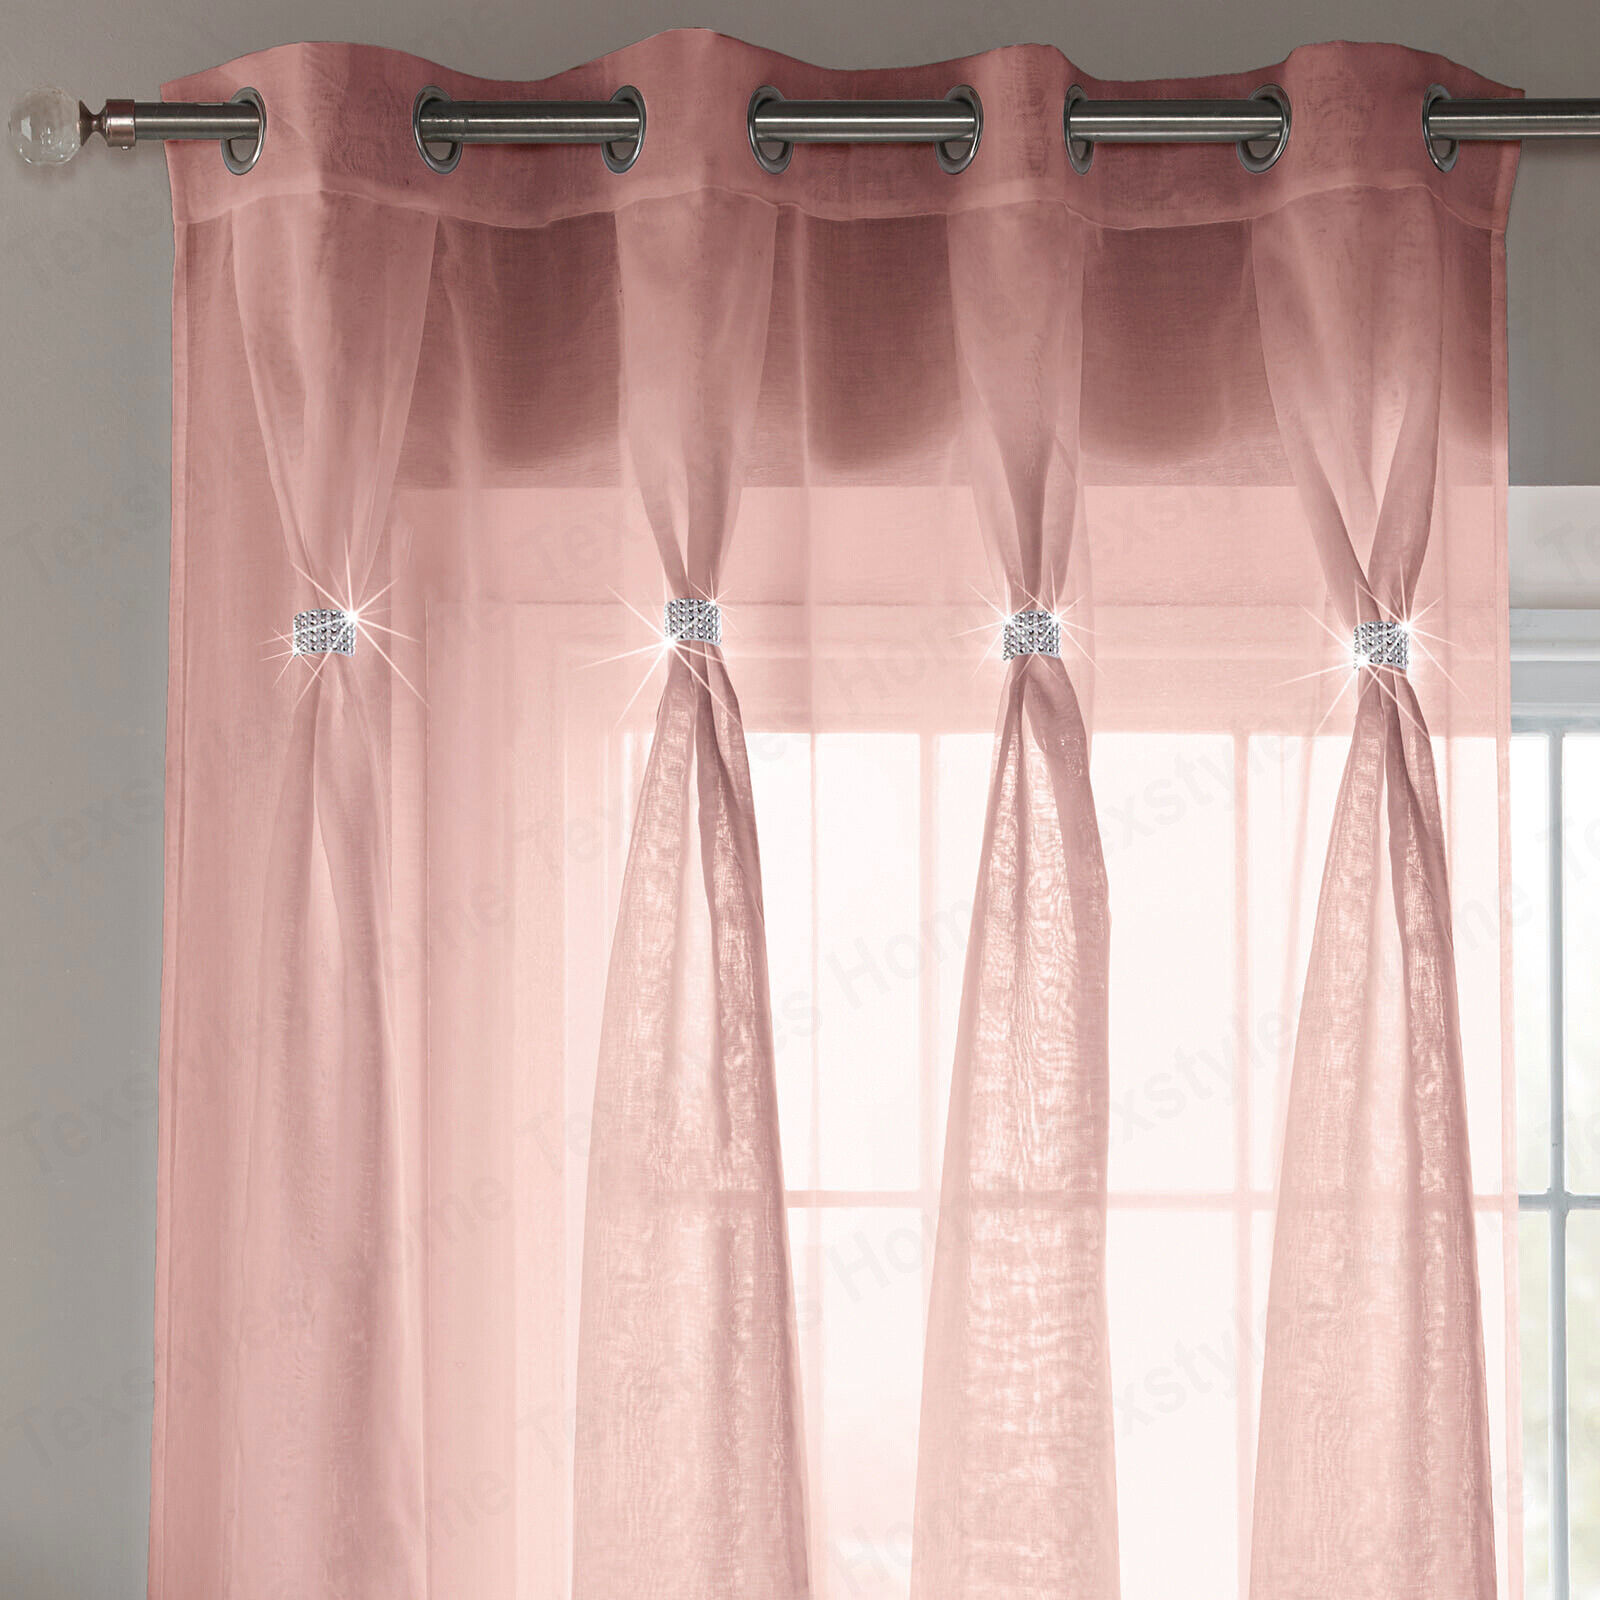 Blush Pink Diana Dolly Diamante Sheer Voile Curtain Eyelet